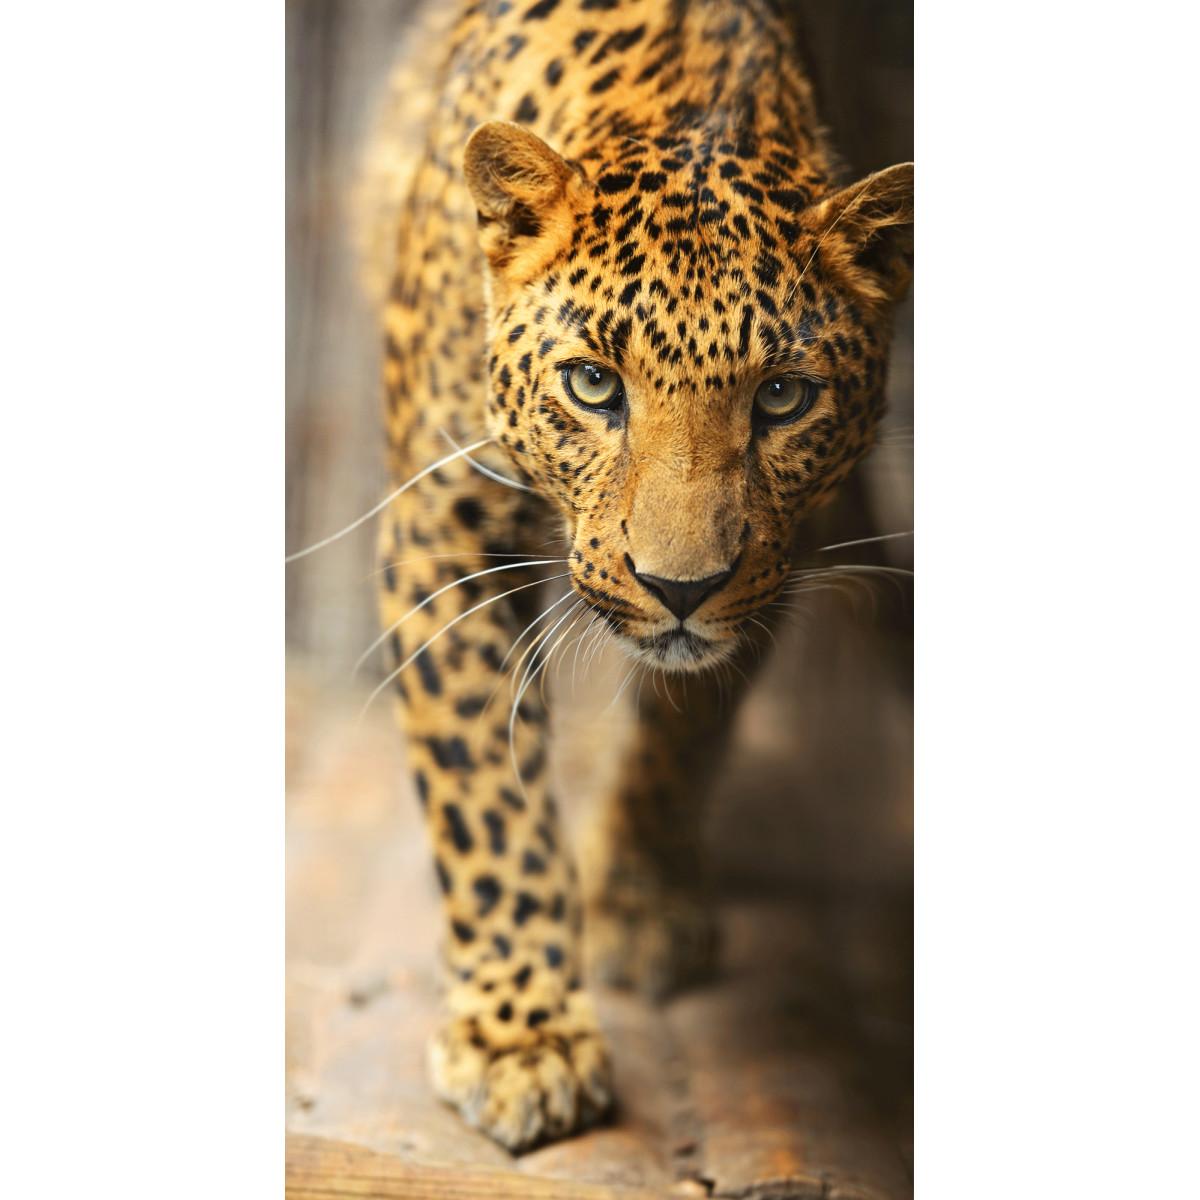 Фотообои «Леопард» флизелиновые 130x250 см E515030